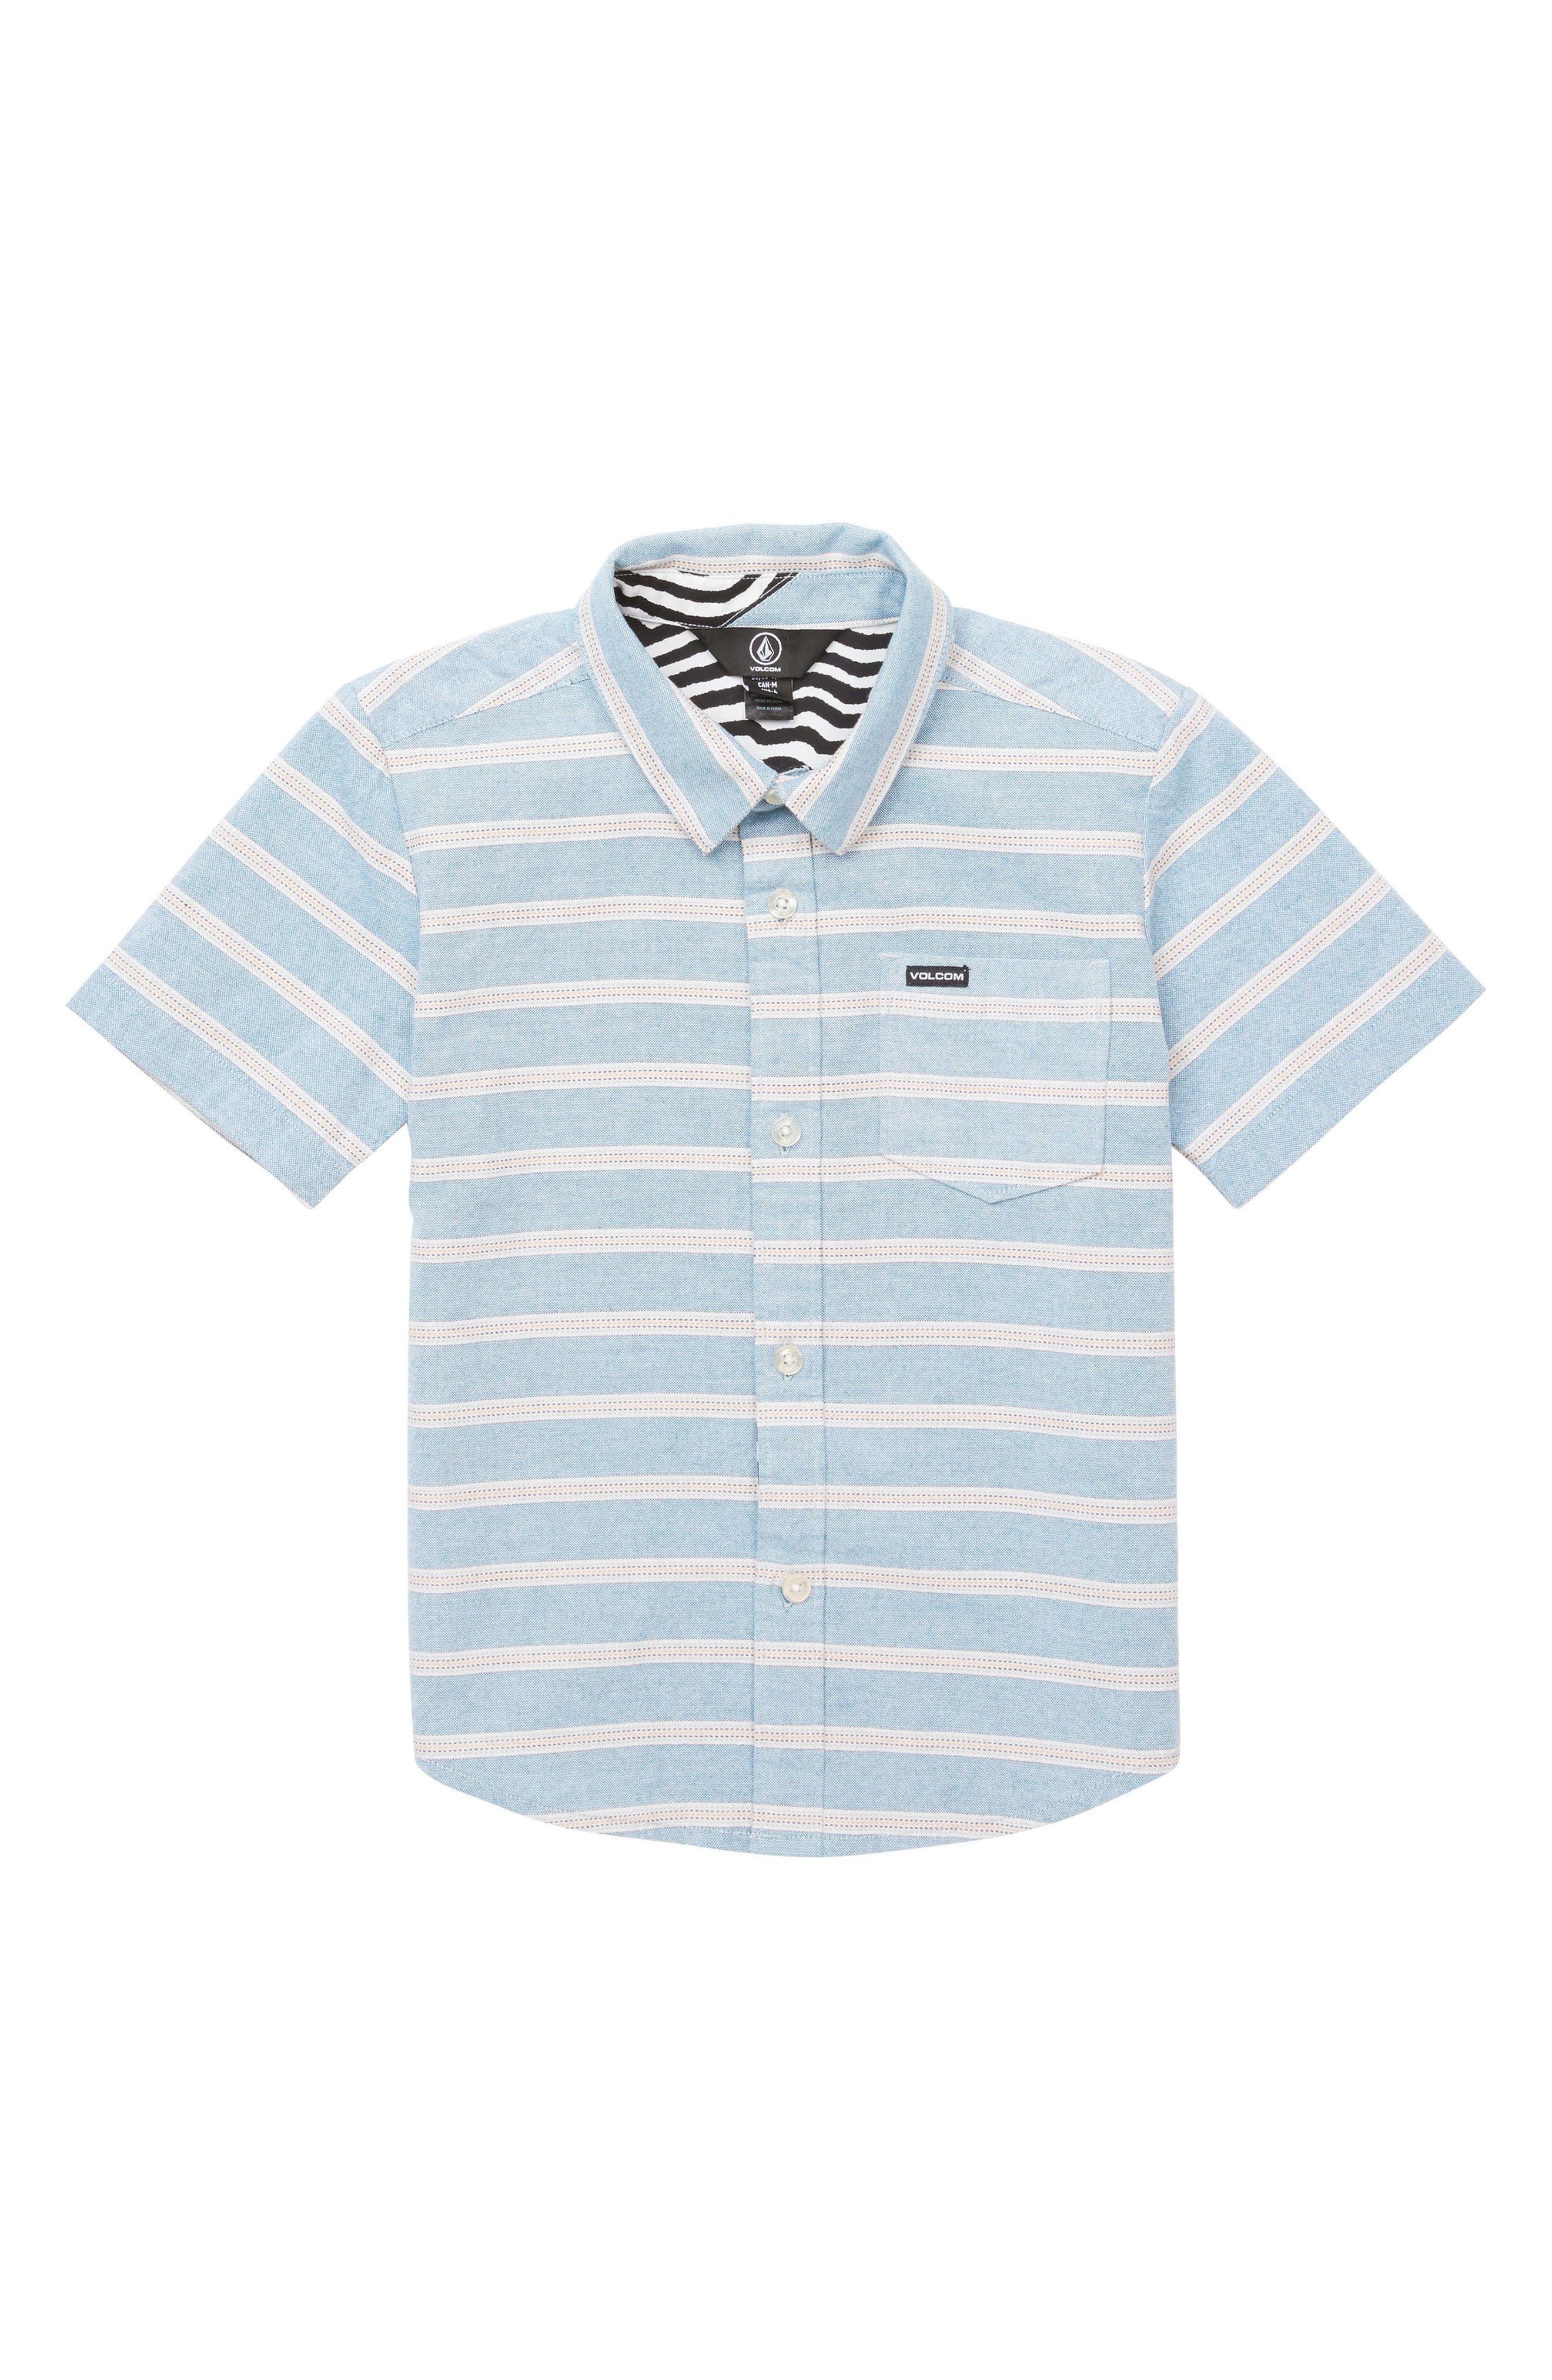 Branson Stripe Woven Shirt,                         Main,                         color, 400